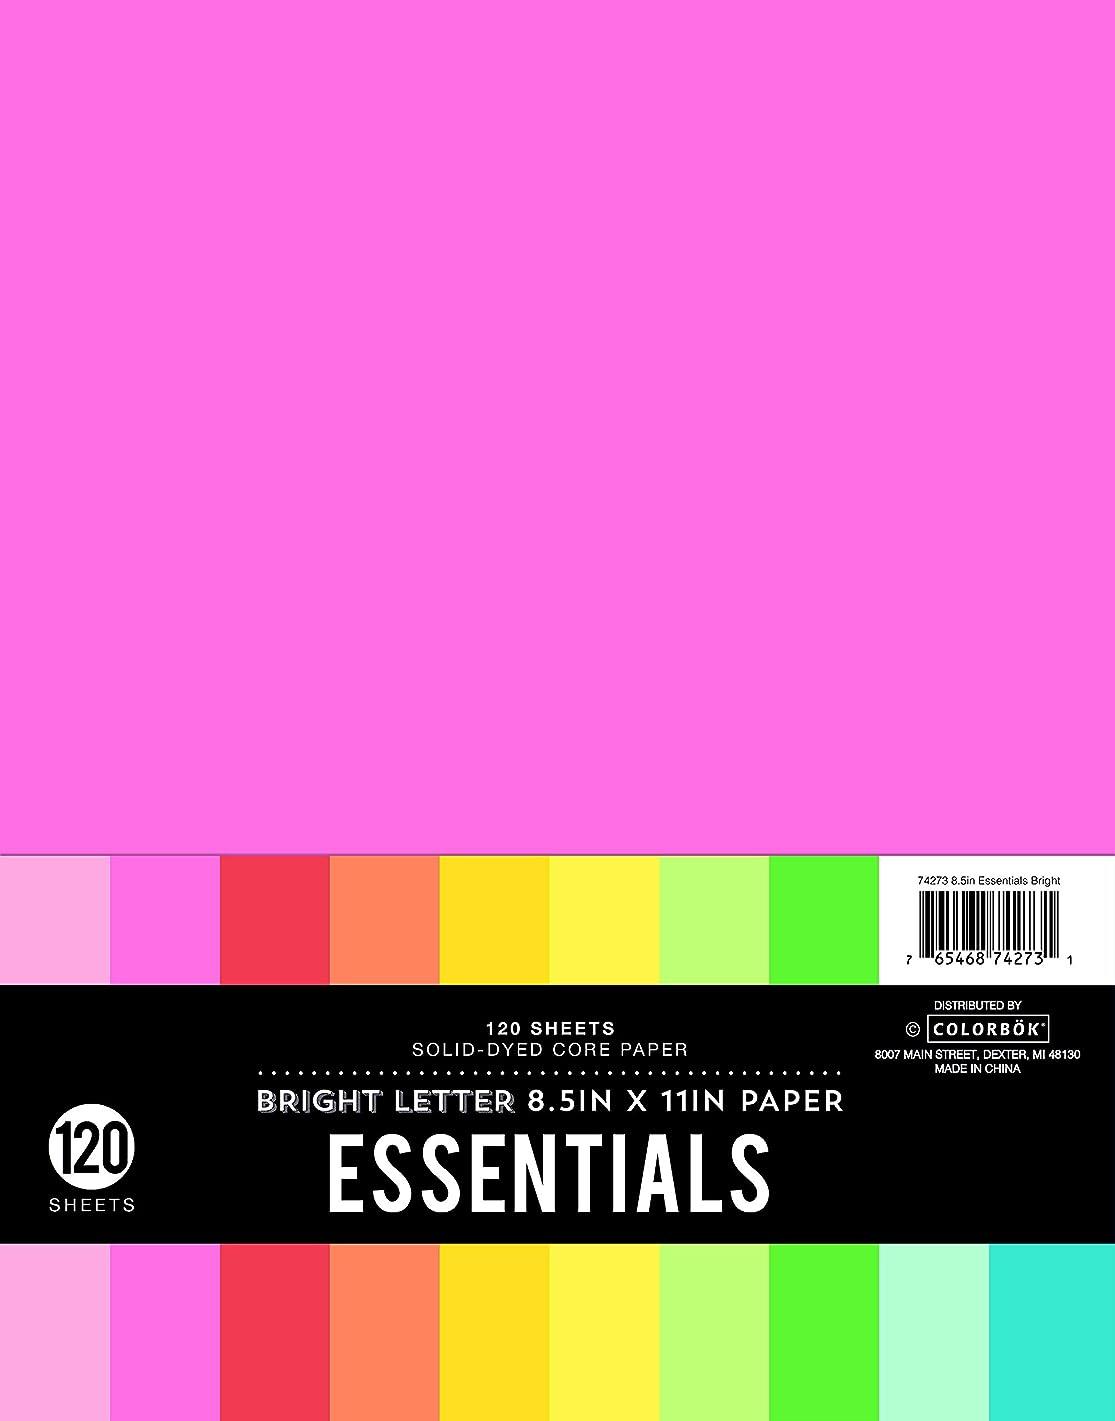 Colorbok 74273 8.5 Paper Essentials Bright